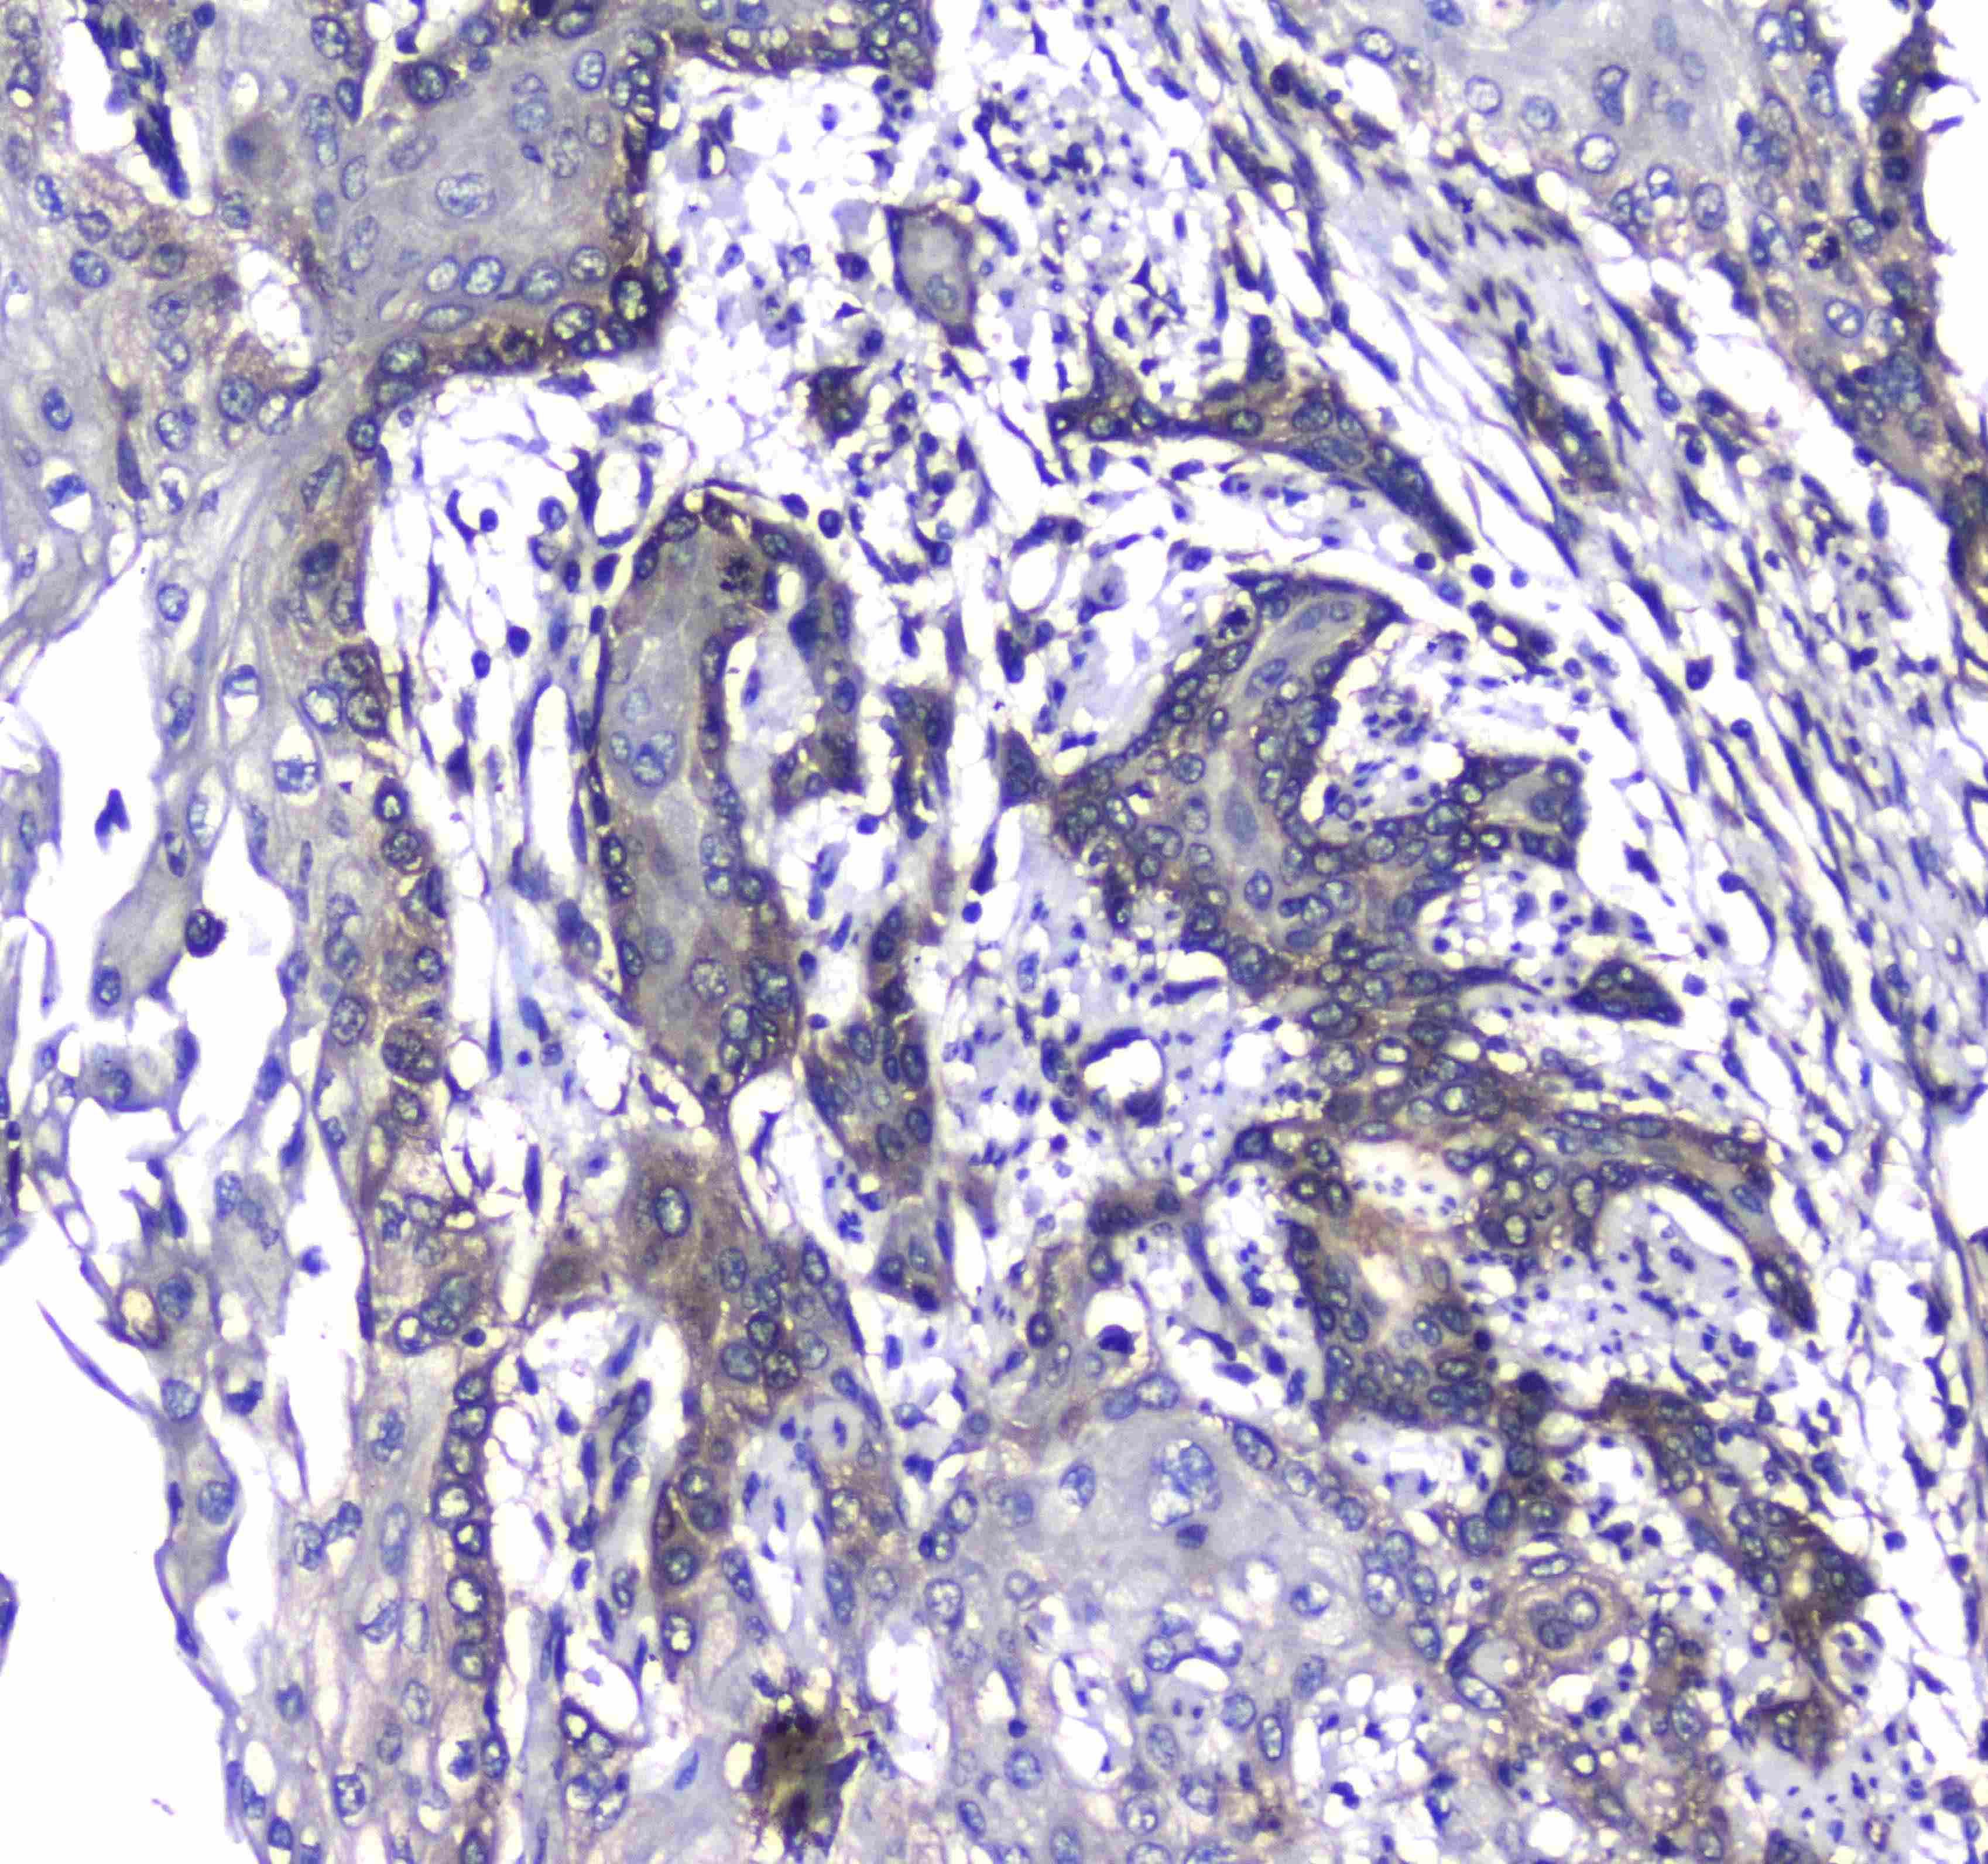 CD171 (L1CAM) Antibody in Immunohistochemistry (Paraffin) (IHC (P))